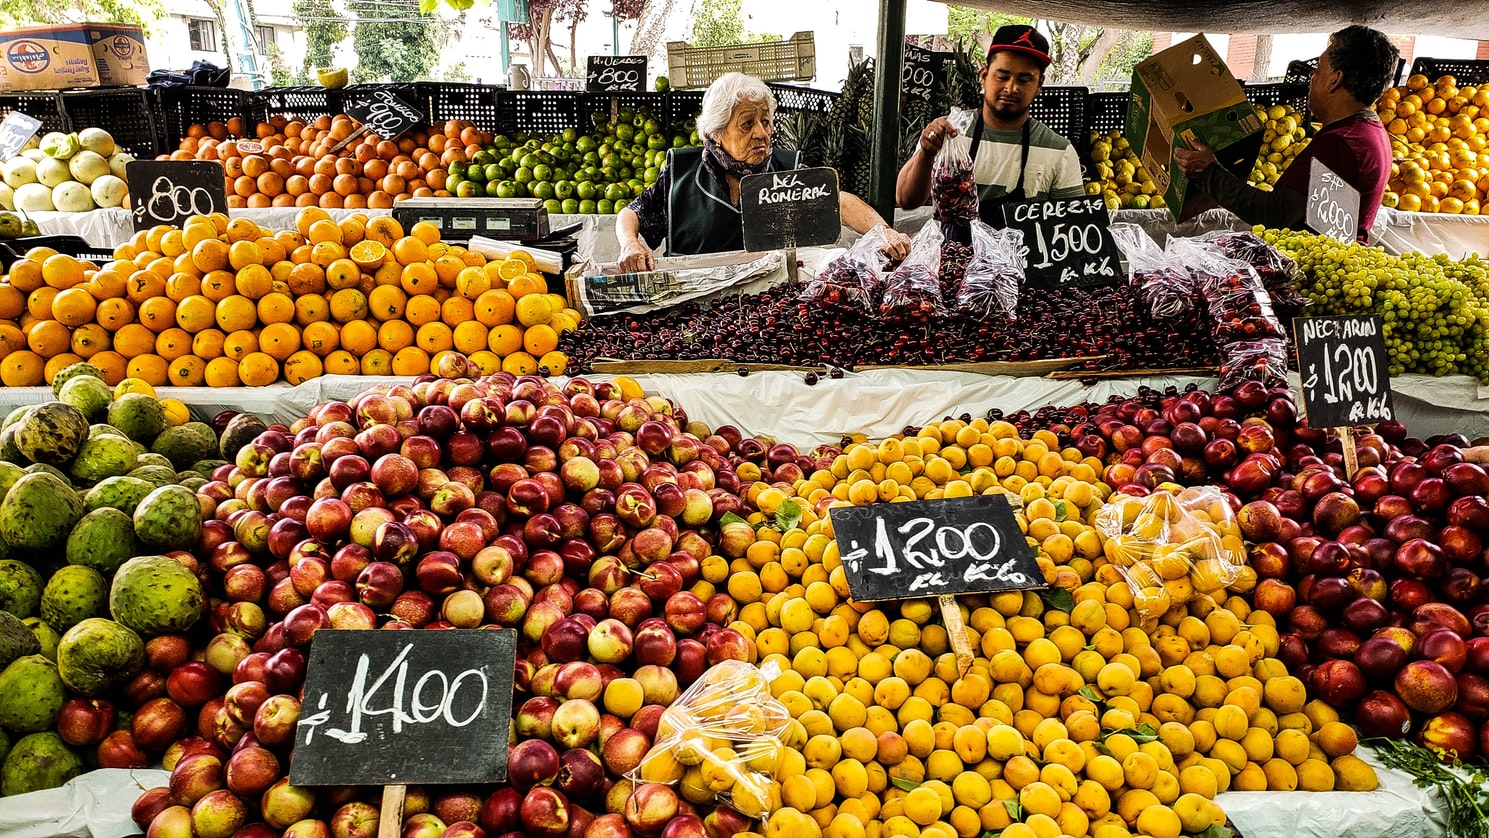 lots of fruit during daytime market